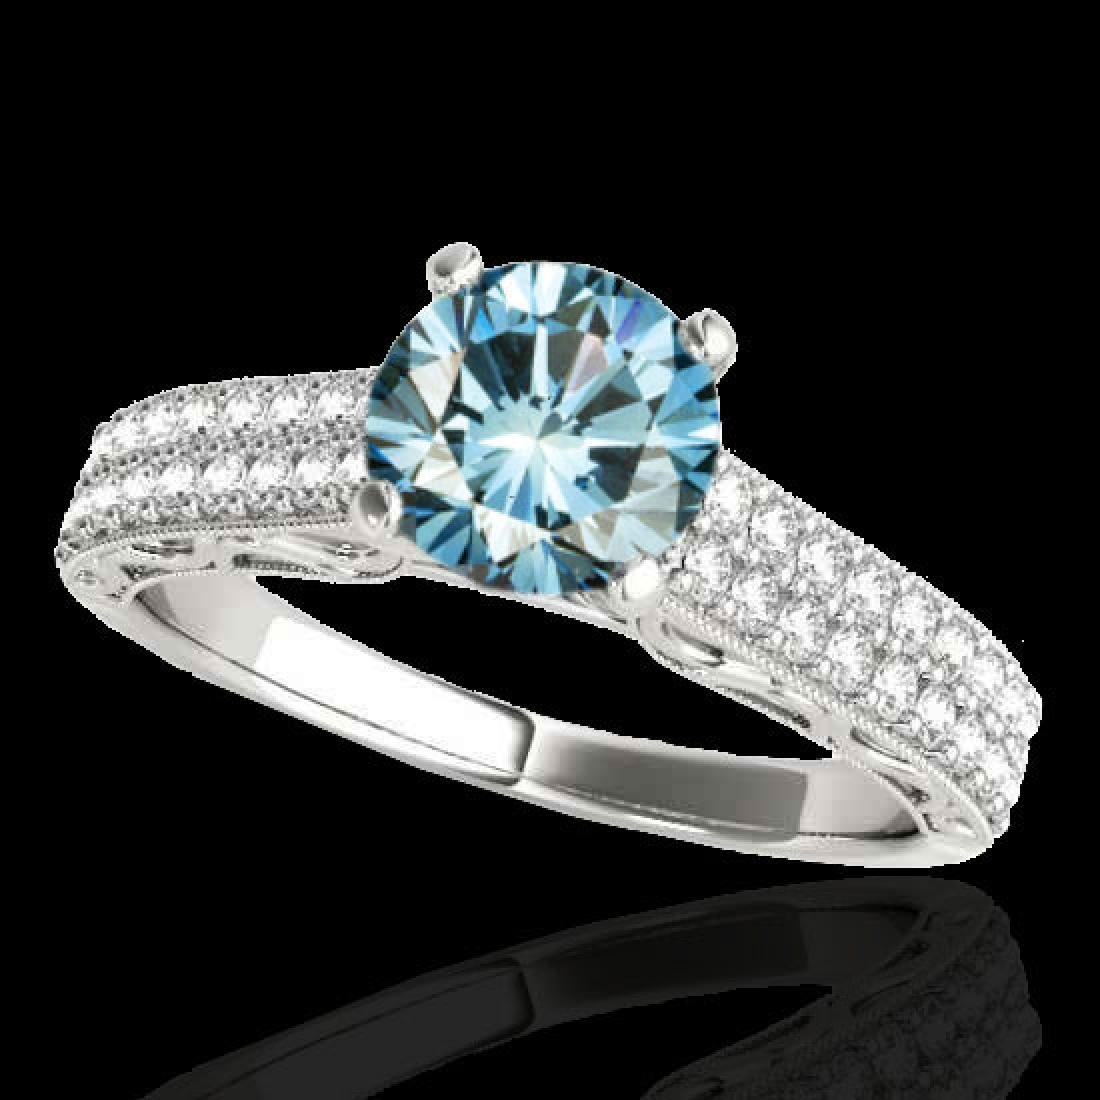 1.91 CTW SI Certified Blue Diamond Solitaire Antique